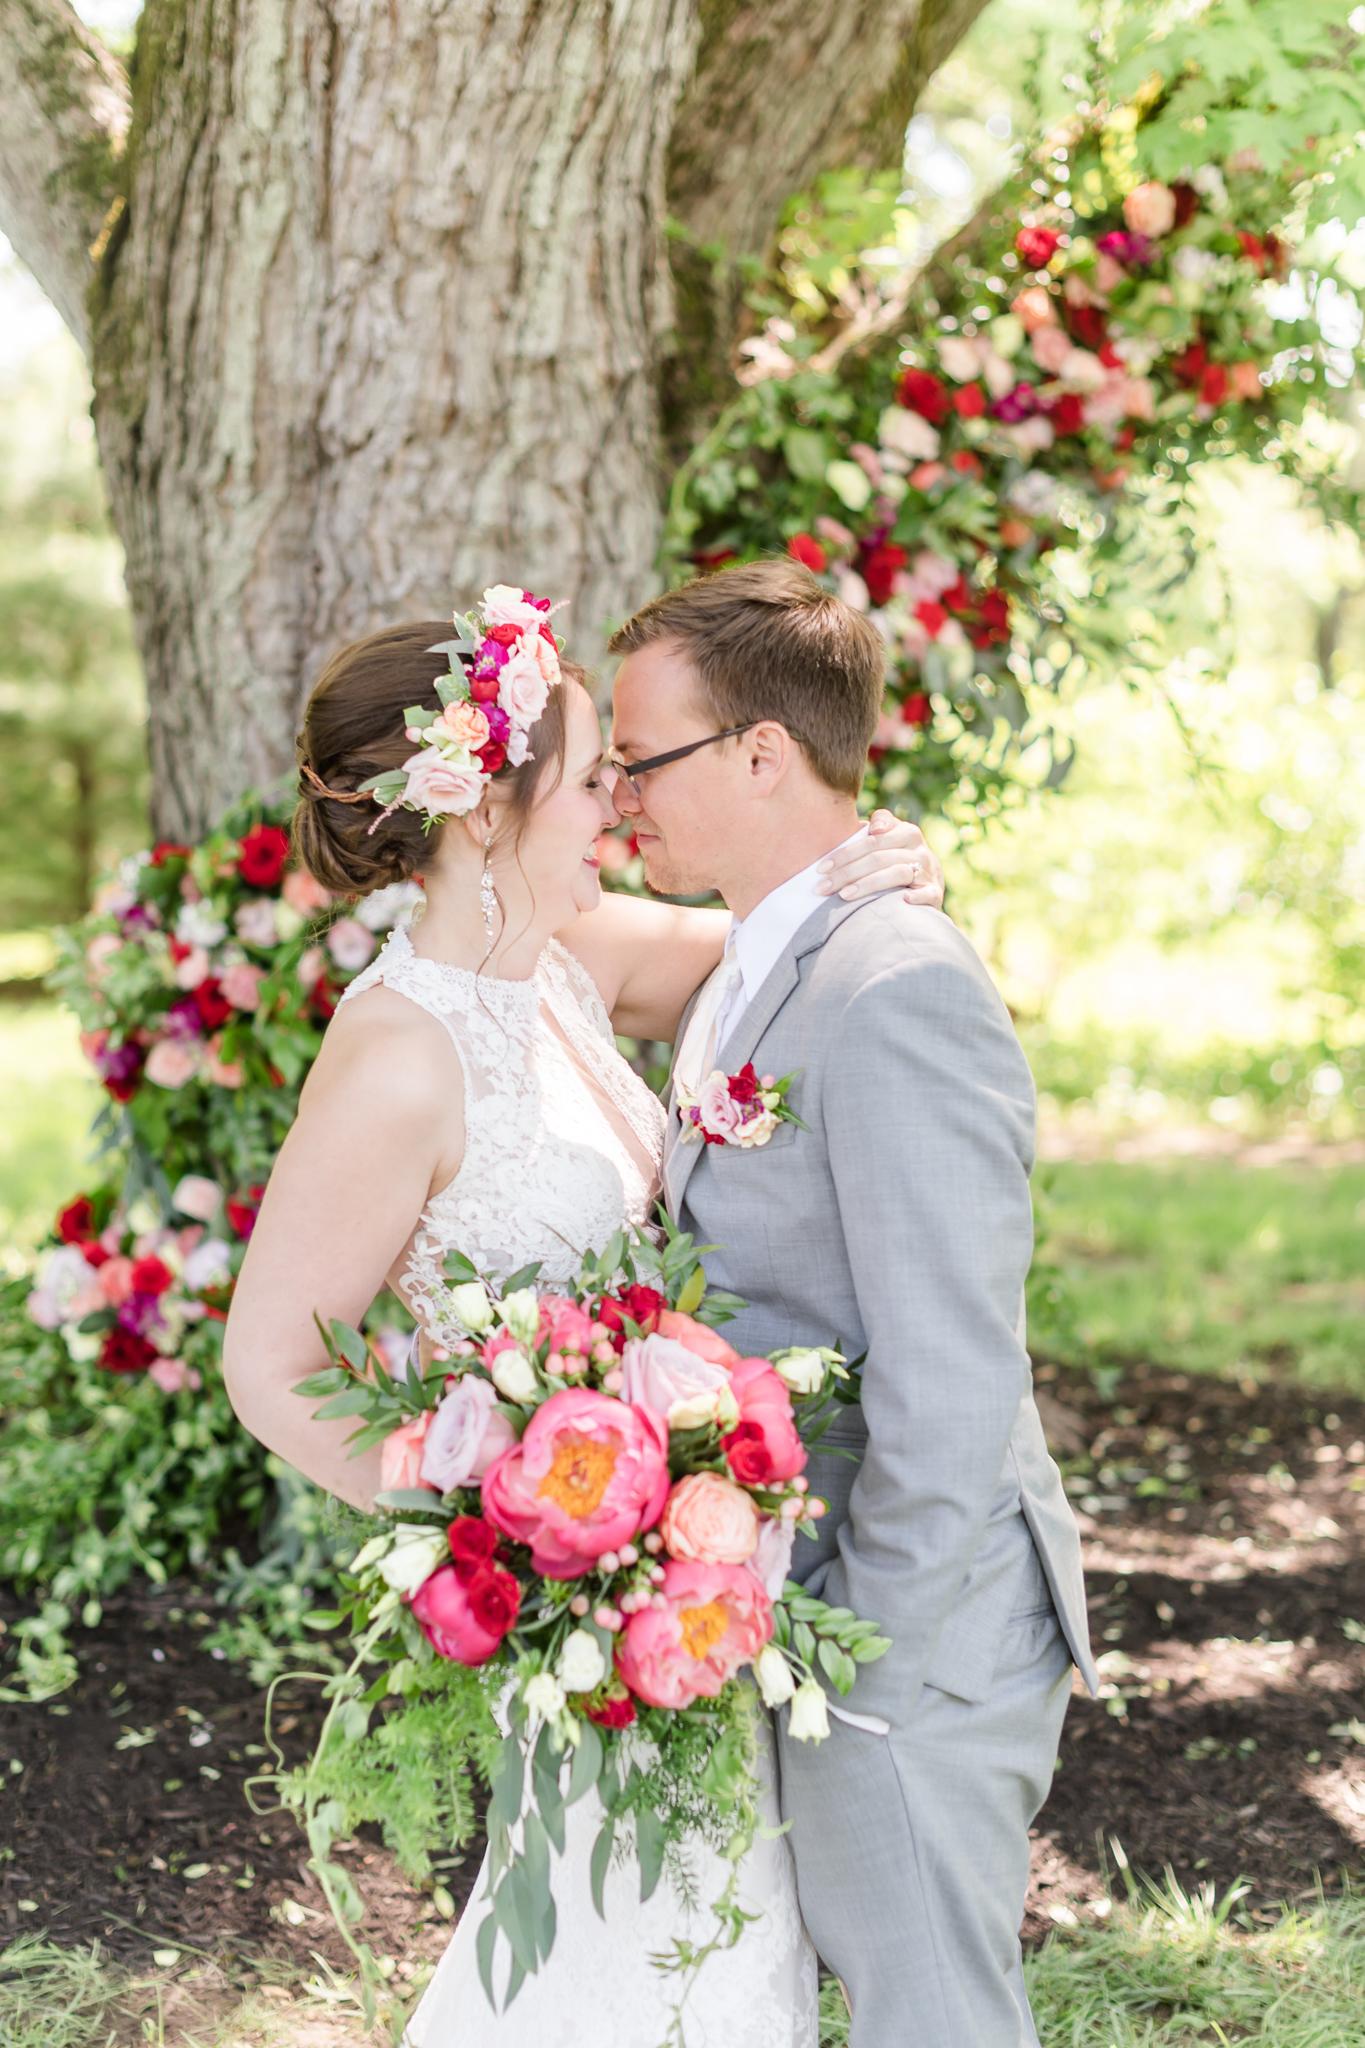 Mustard Seed Gardens Wedding Indianapolis Noblesvile Fishers Wedding Photographer-49.jpg